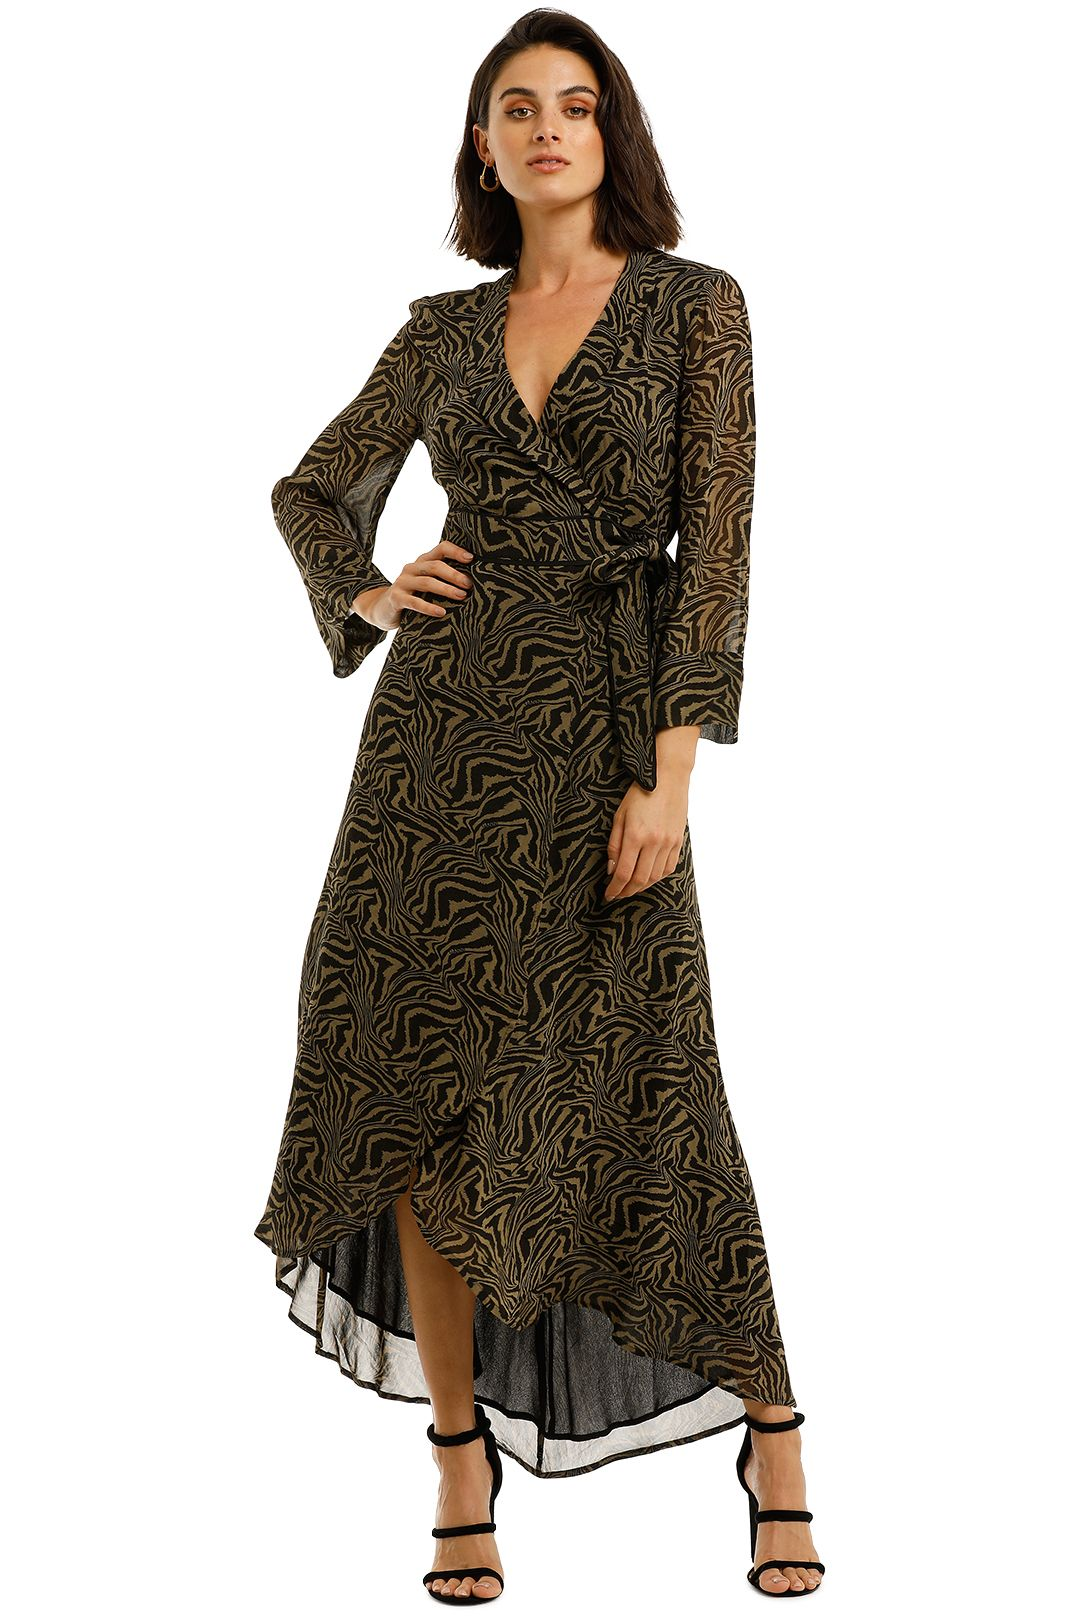 Ganni-Printed-Georgette-LS-Long-Wrap-Dress-Kalamata-Front